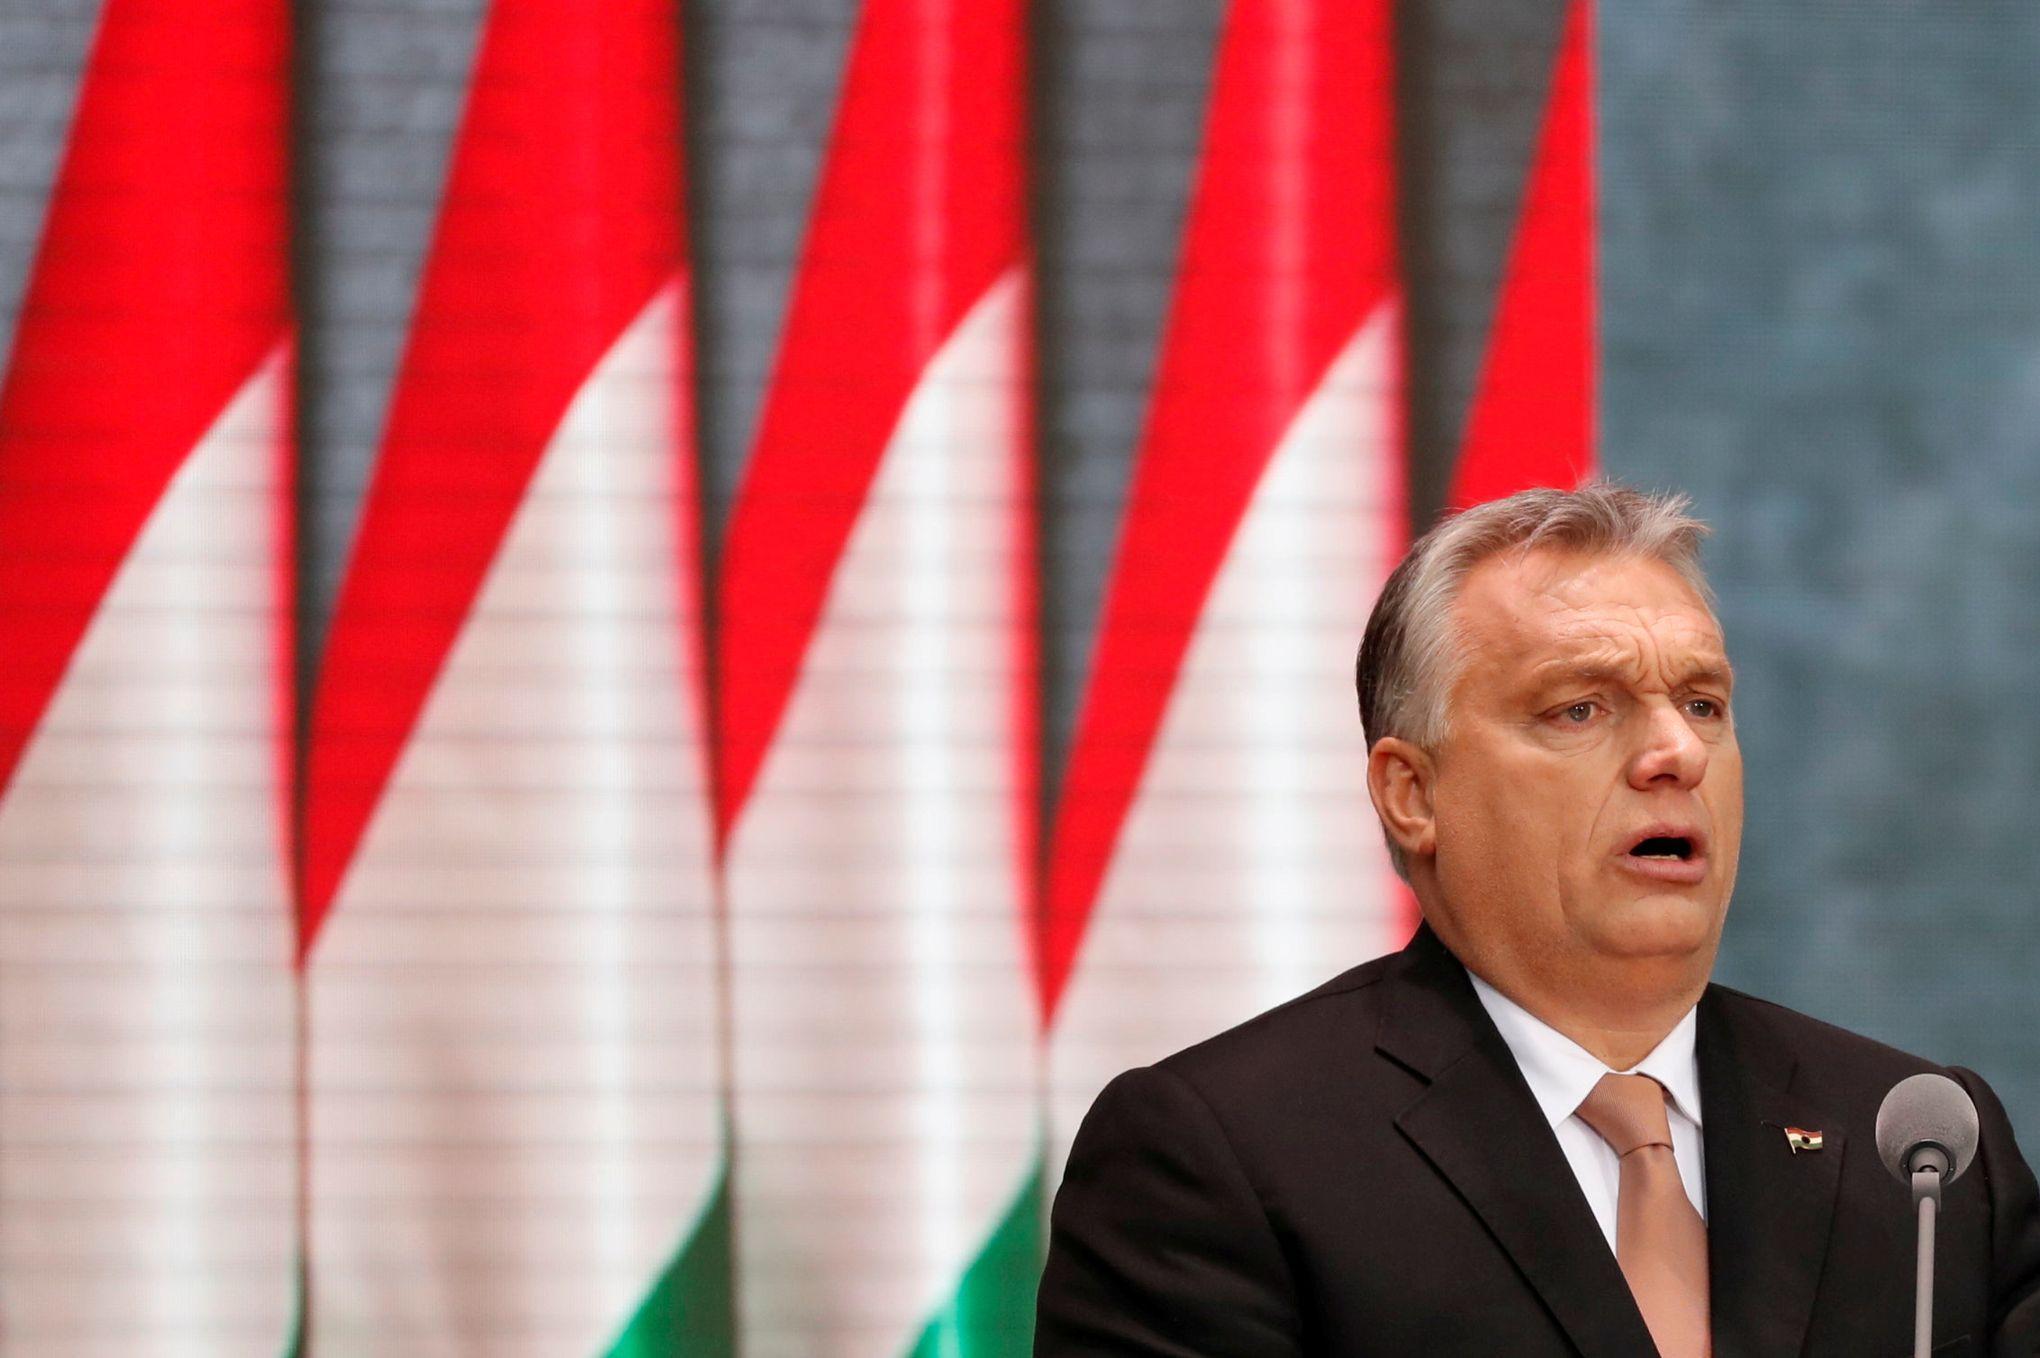 «Viktor Orban n'est pas le diable» – Le Figaro 13/11/2018